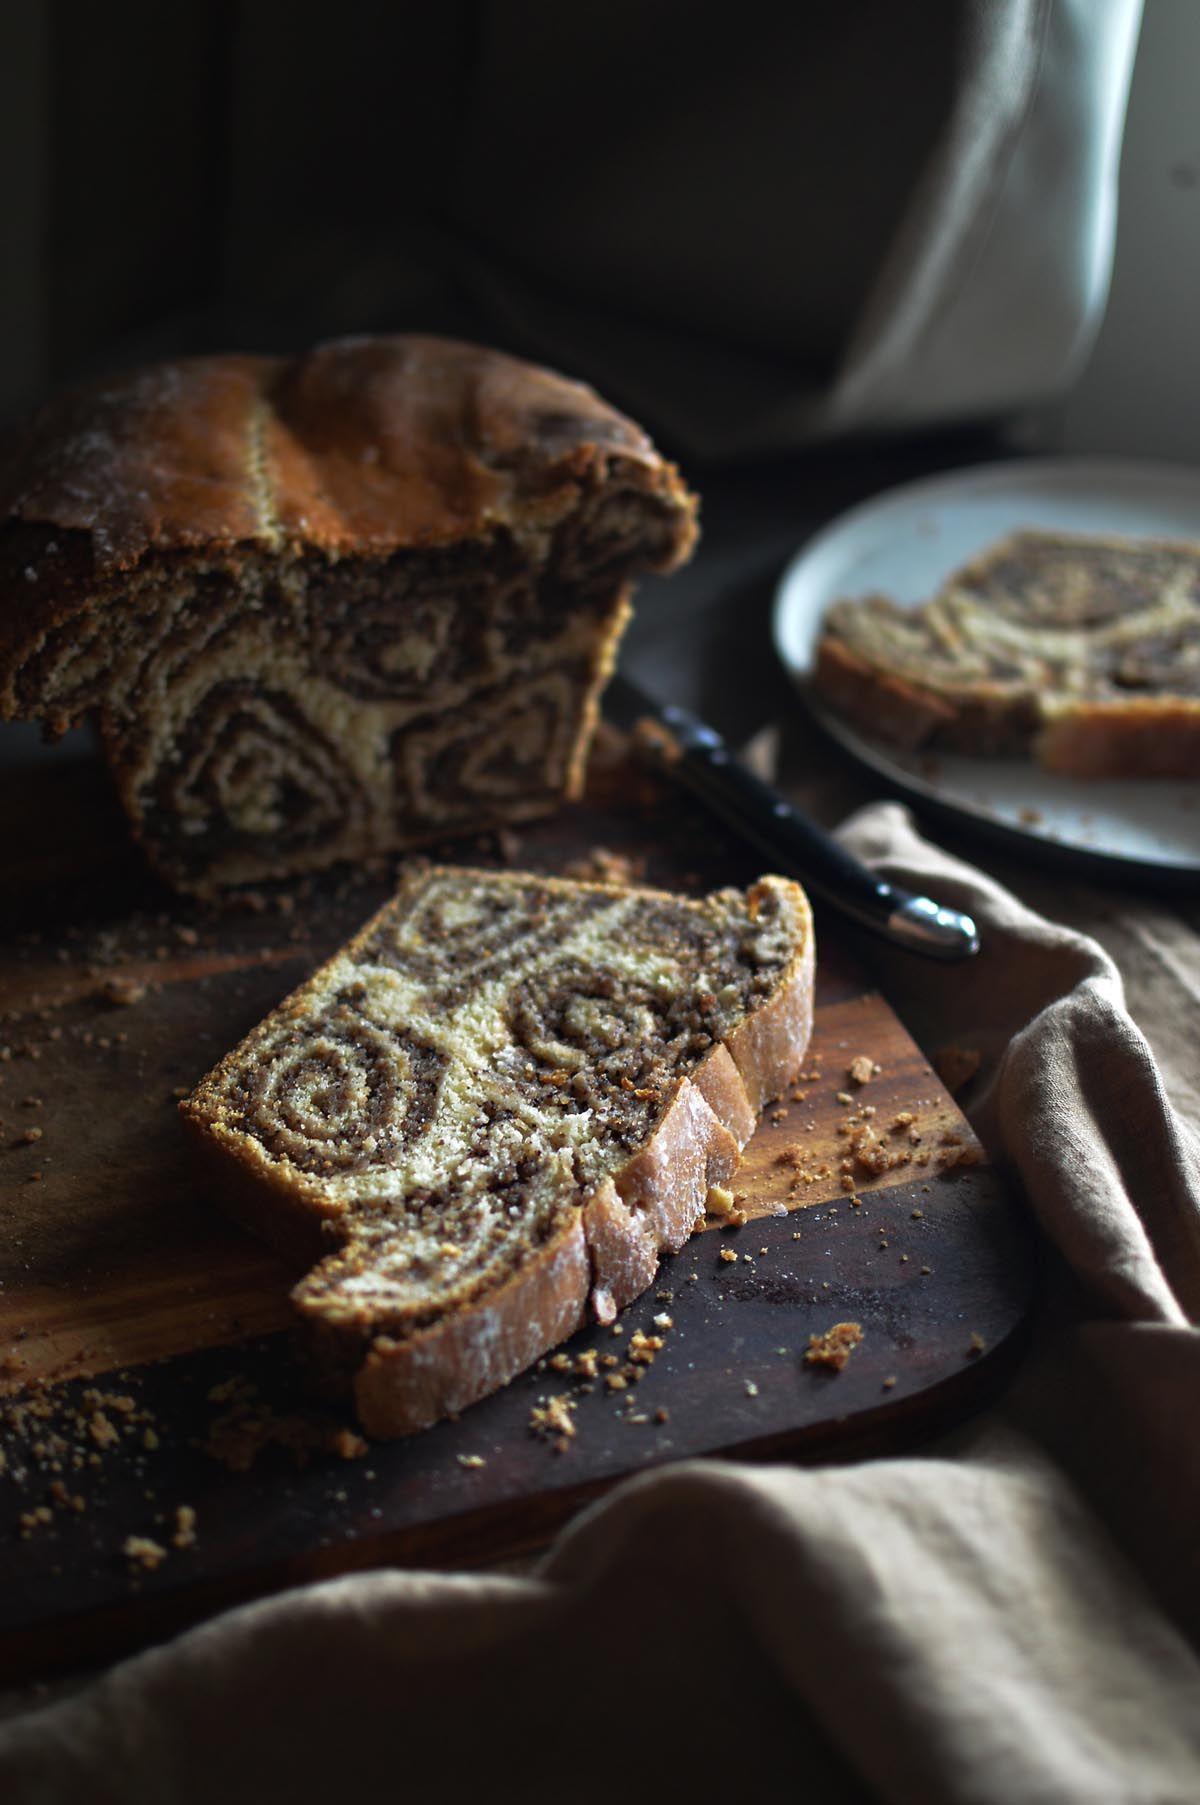 Povitica - Croatian nut roll | heneedsfood.com